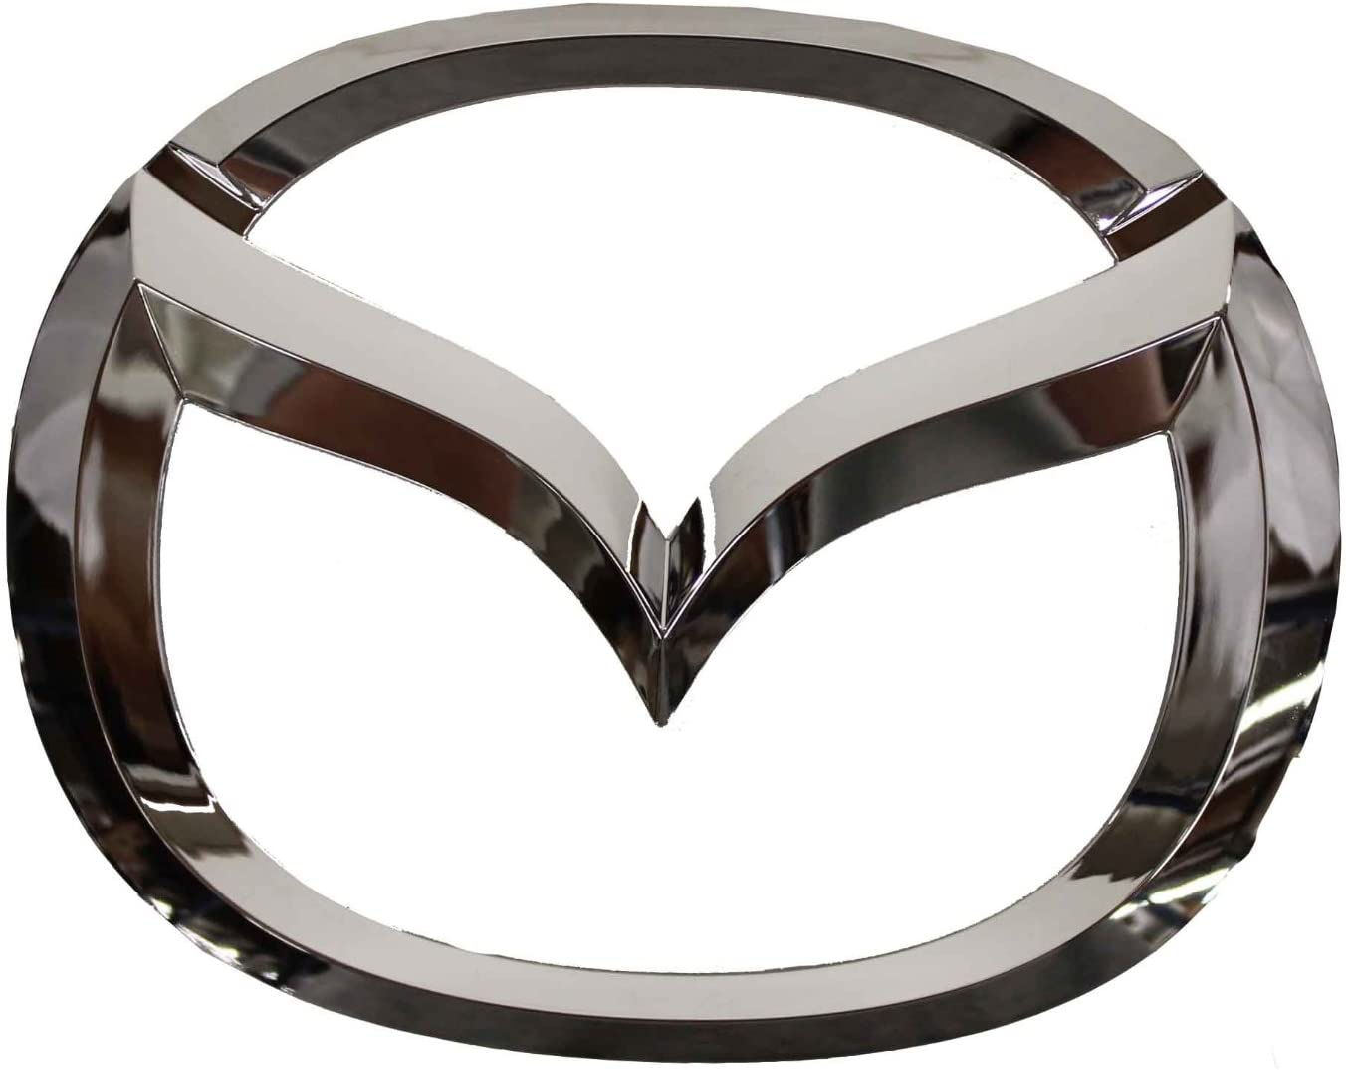 Genuine Mazda Parts C235-51-731A Max 60% OFF Emblem Logo Front Sale special price